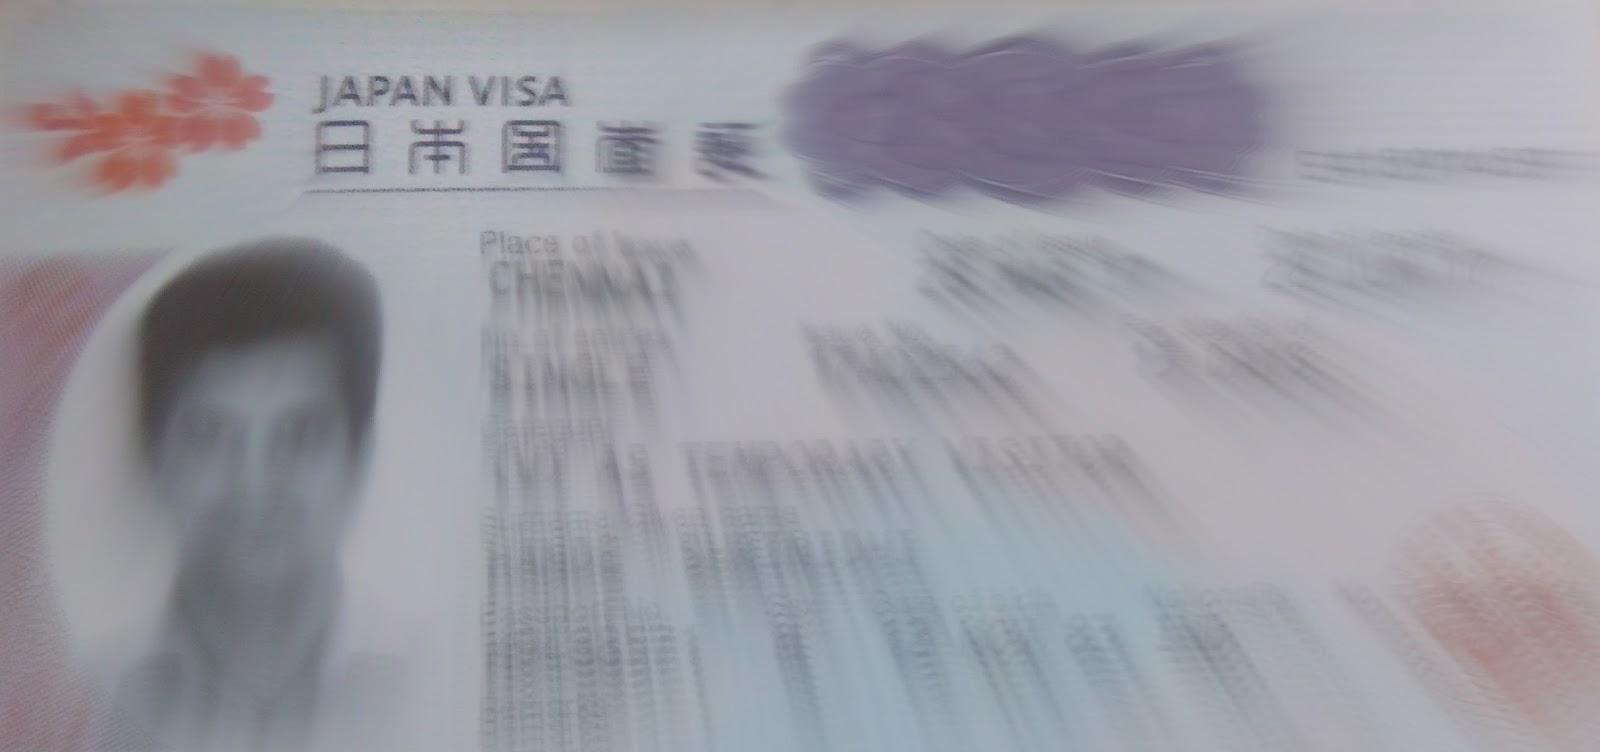 Japan Tourist Visa Process For Indians Enidhi India Travel Blog